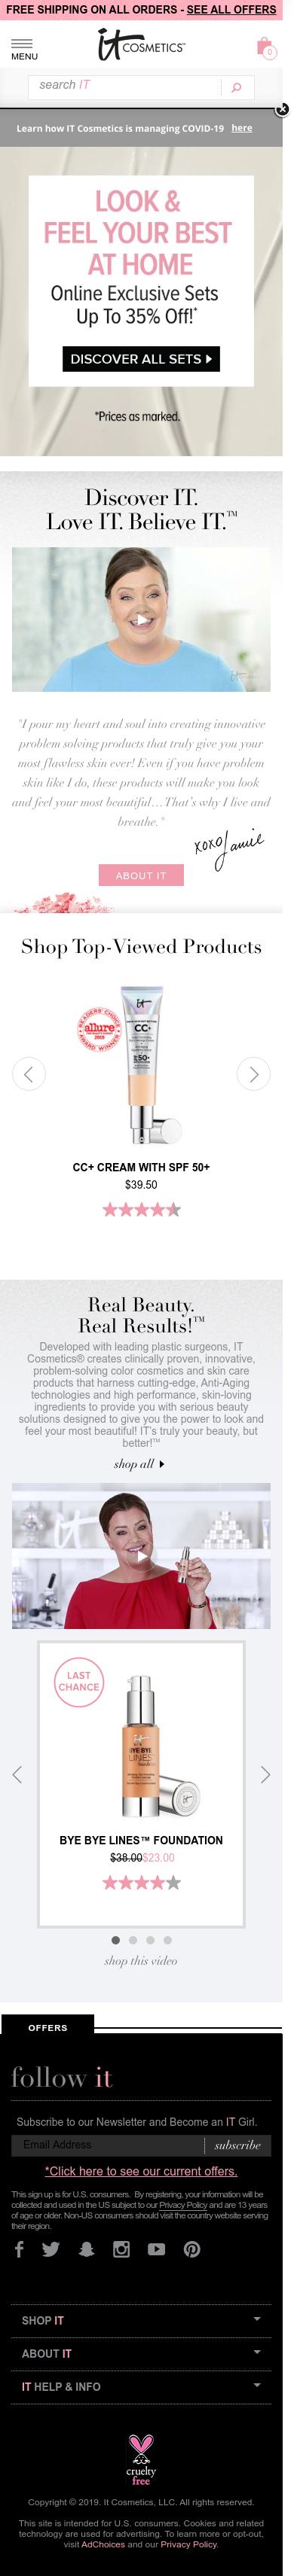 IT Cosmetics Coupon